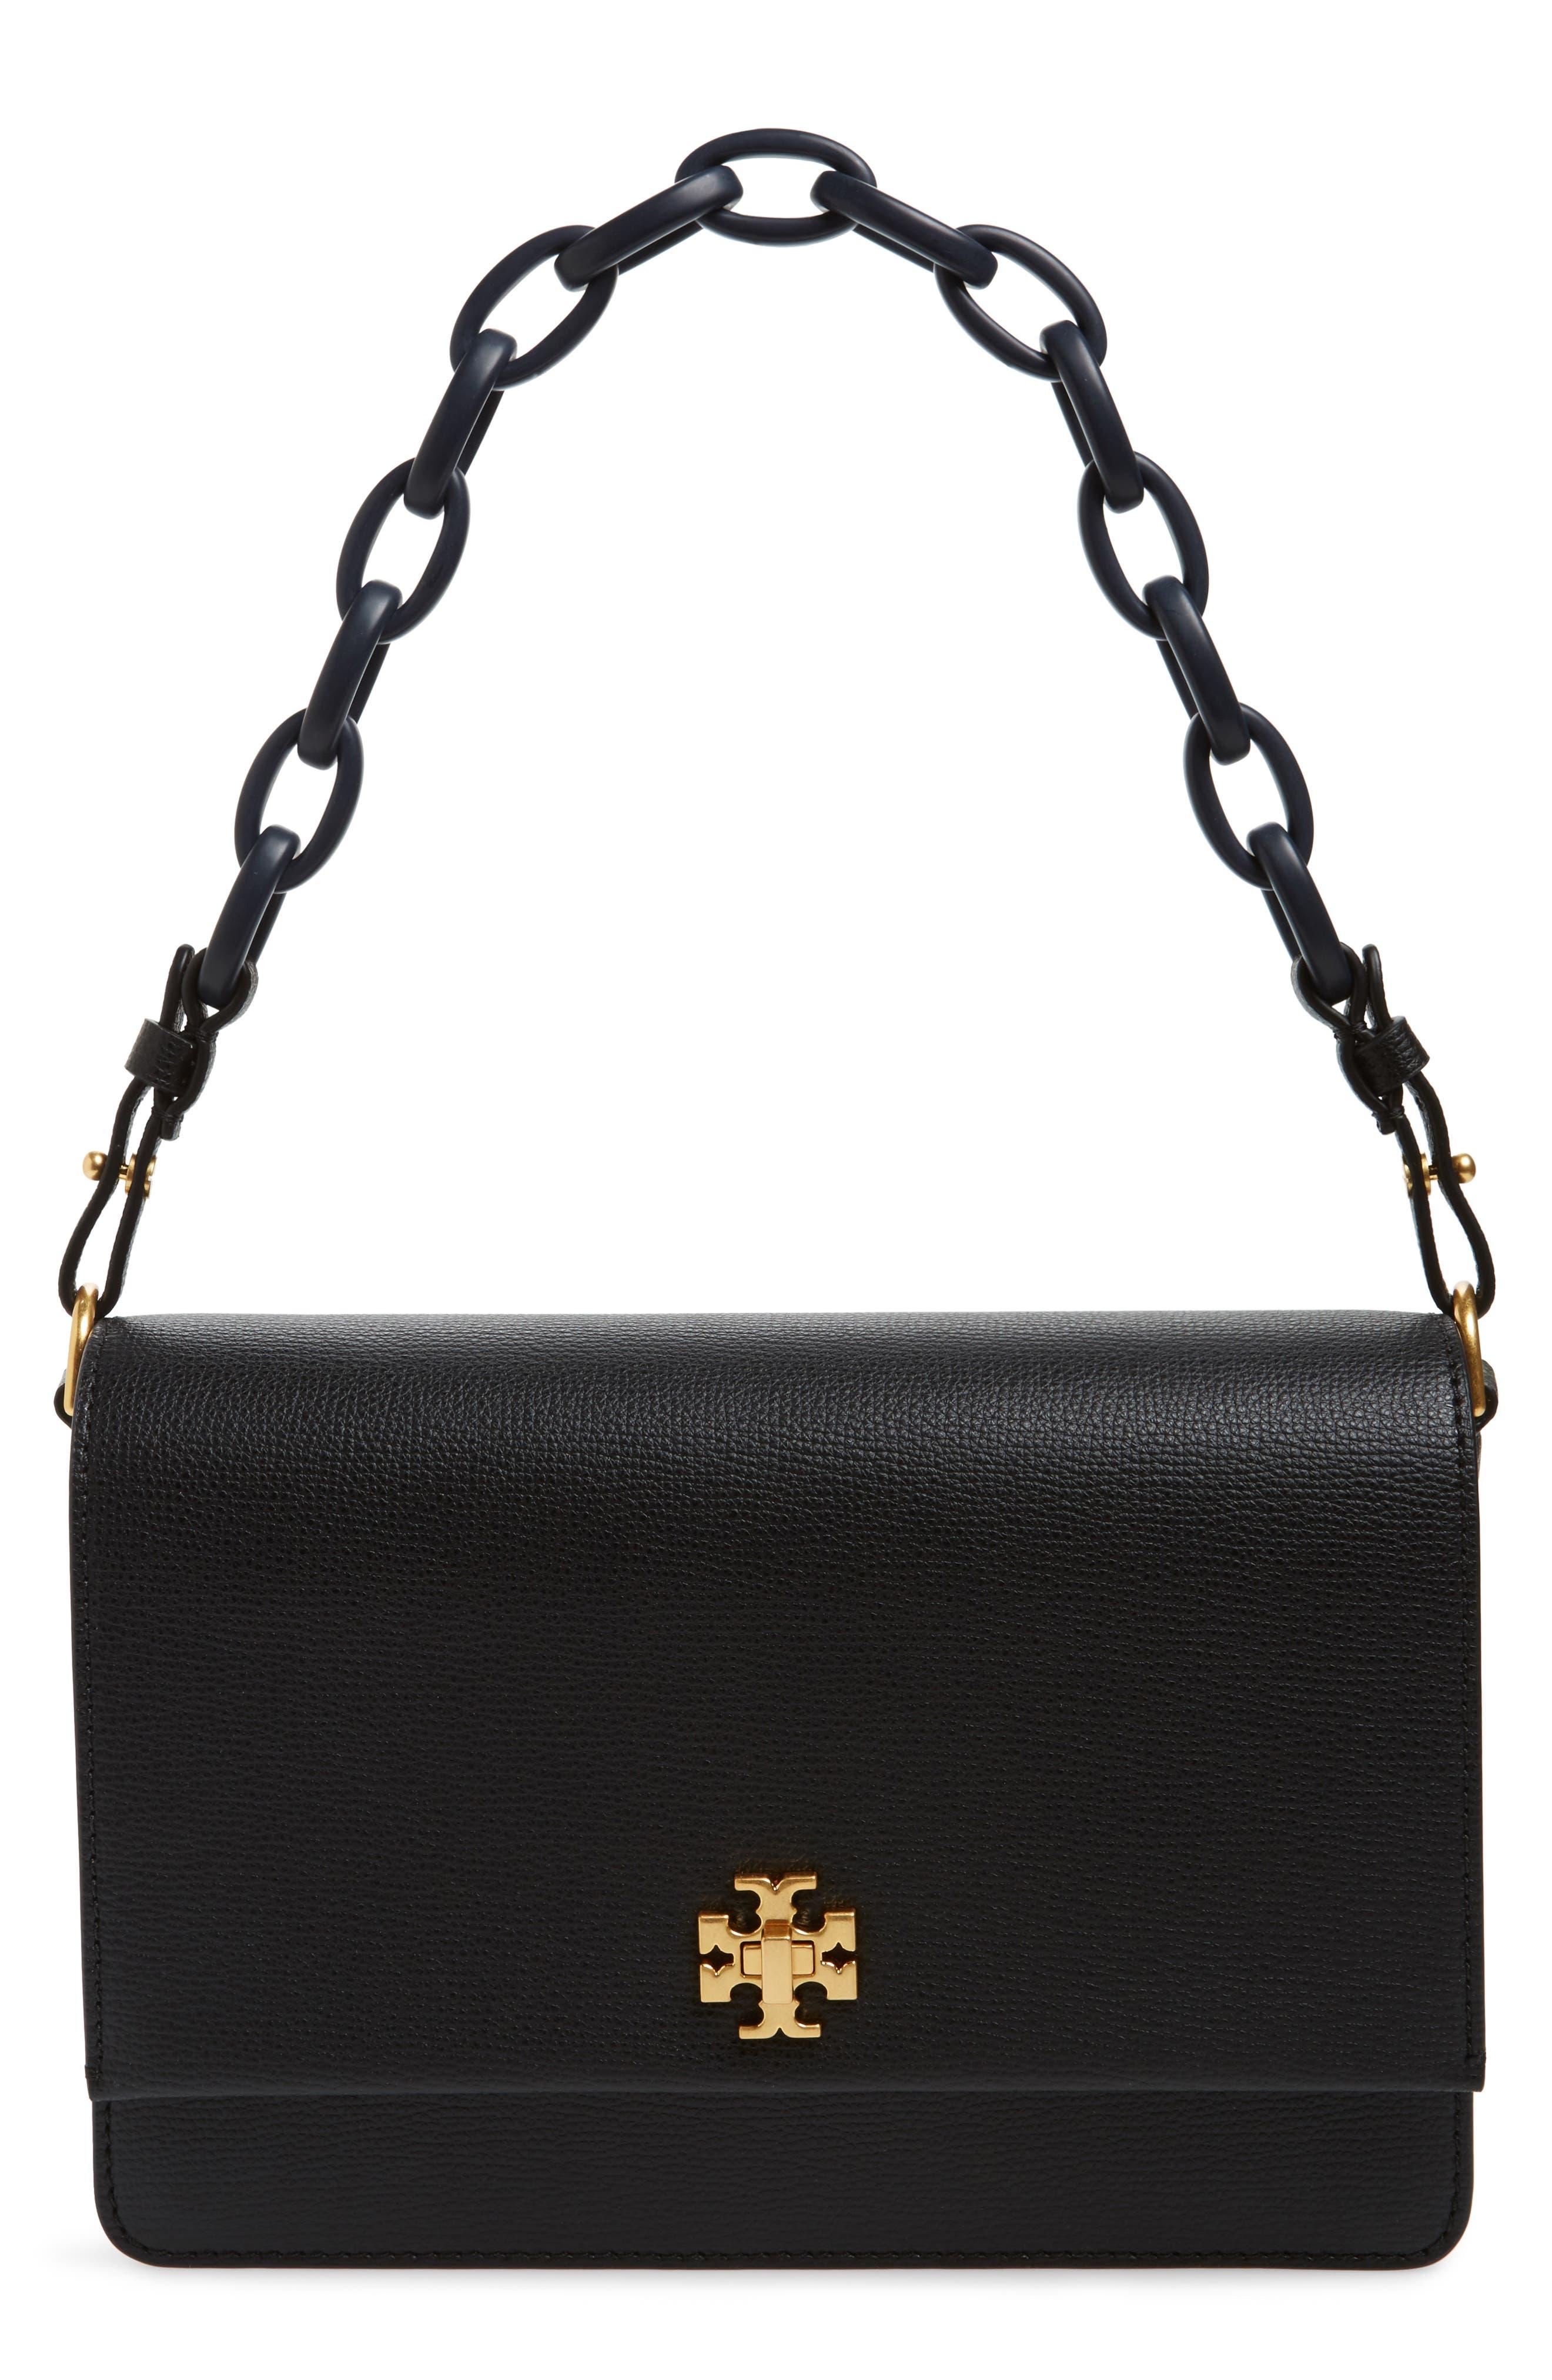 Kira Leather Shoulder Bag,                             Main thumbnail 1, color,                             BLACK